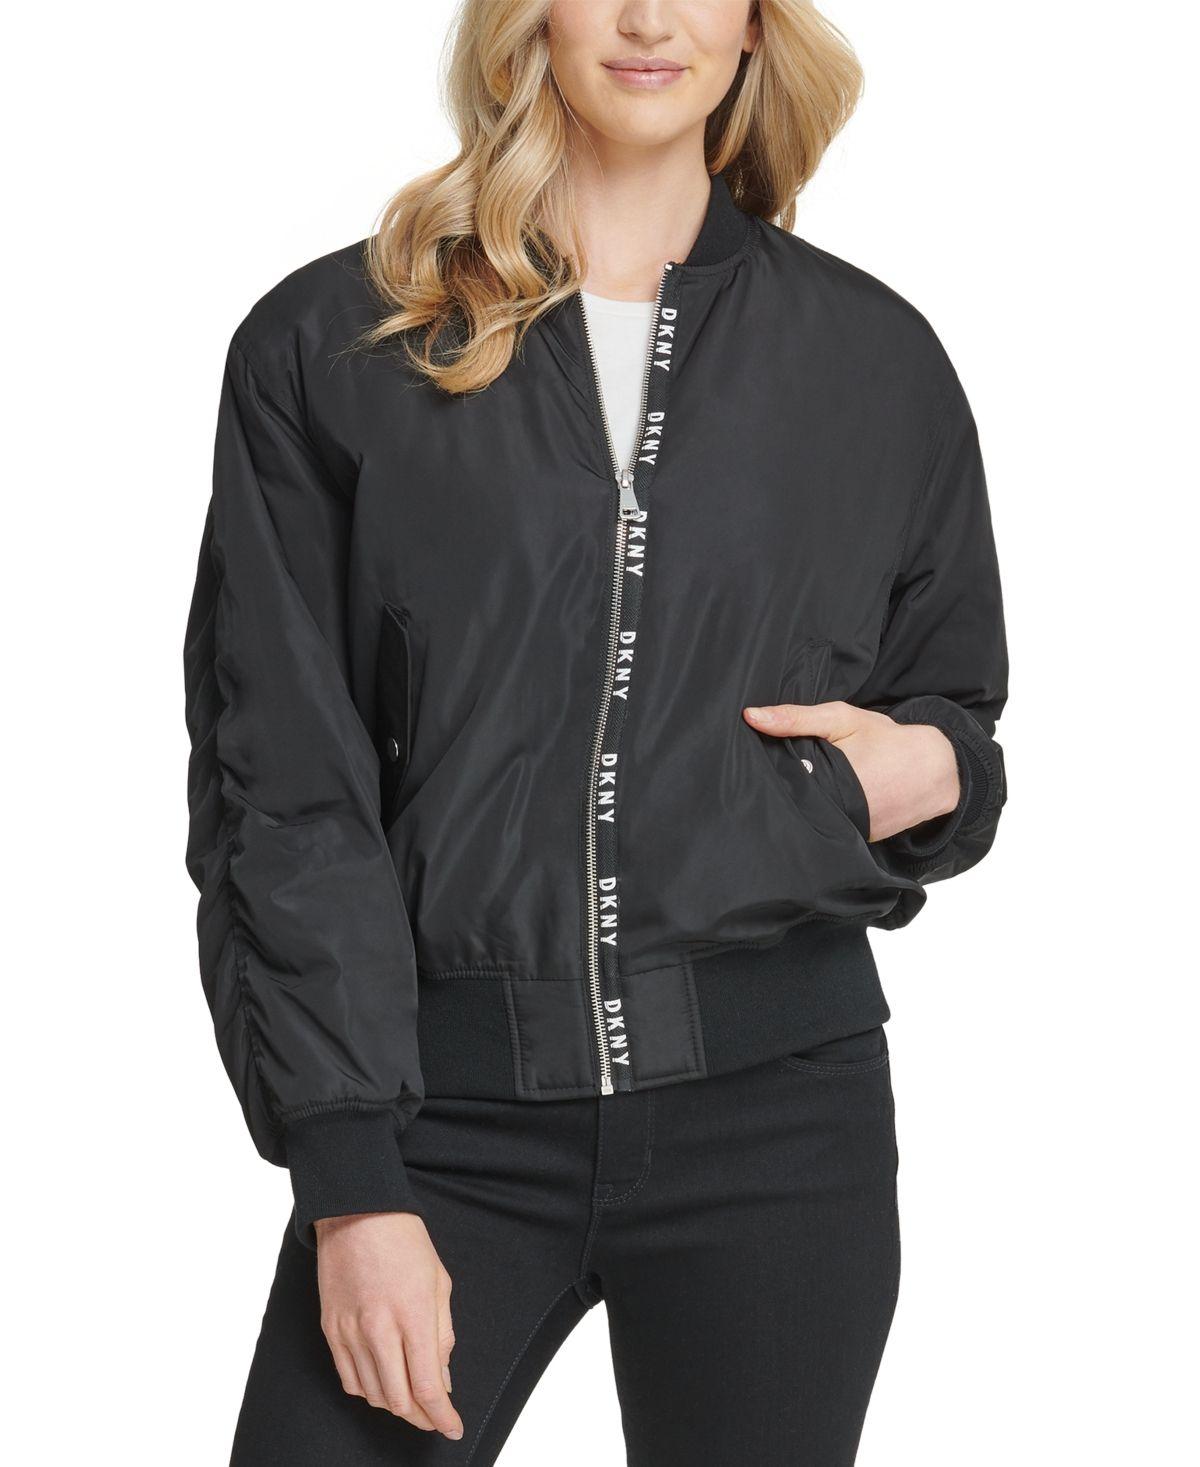 Dkny Bomber Jacket Black | Blazer jackets for women